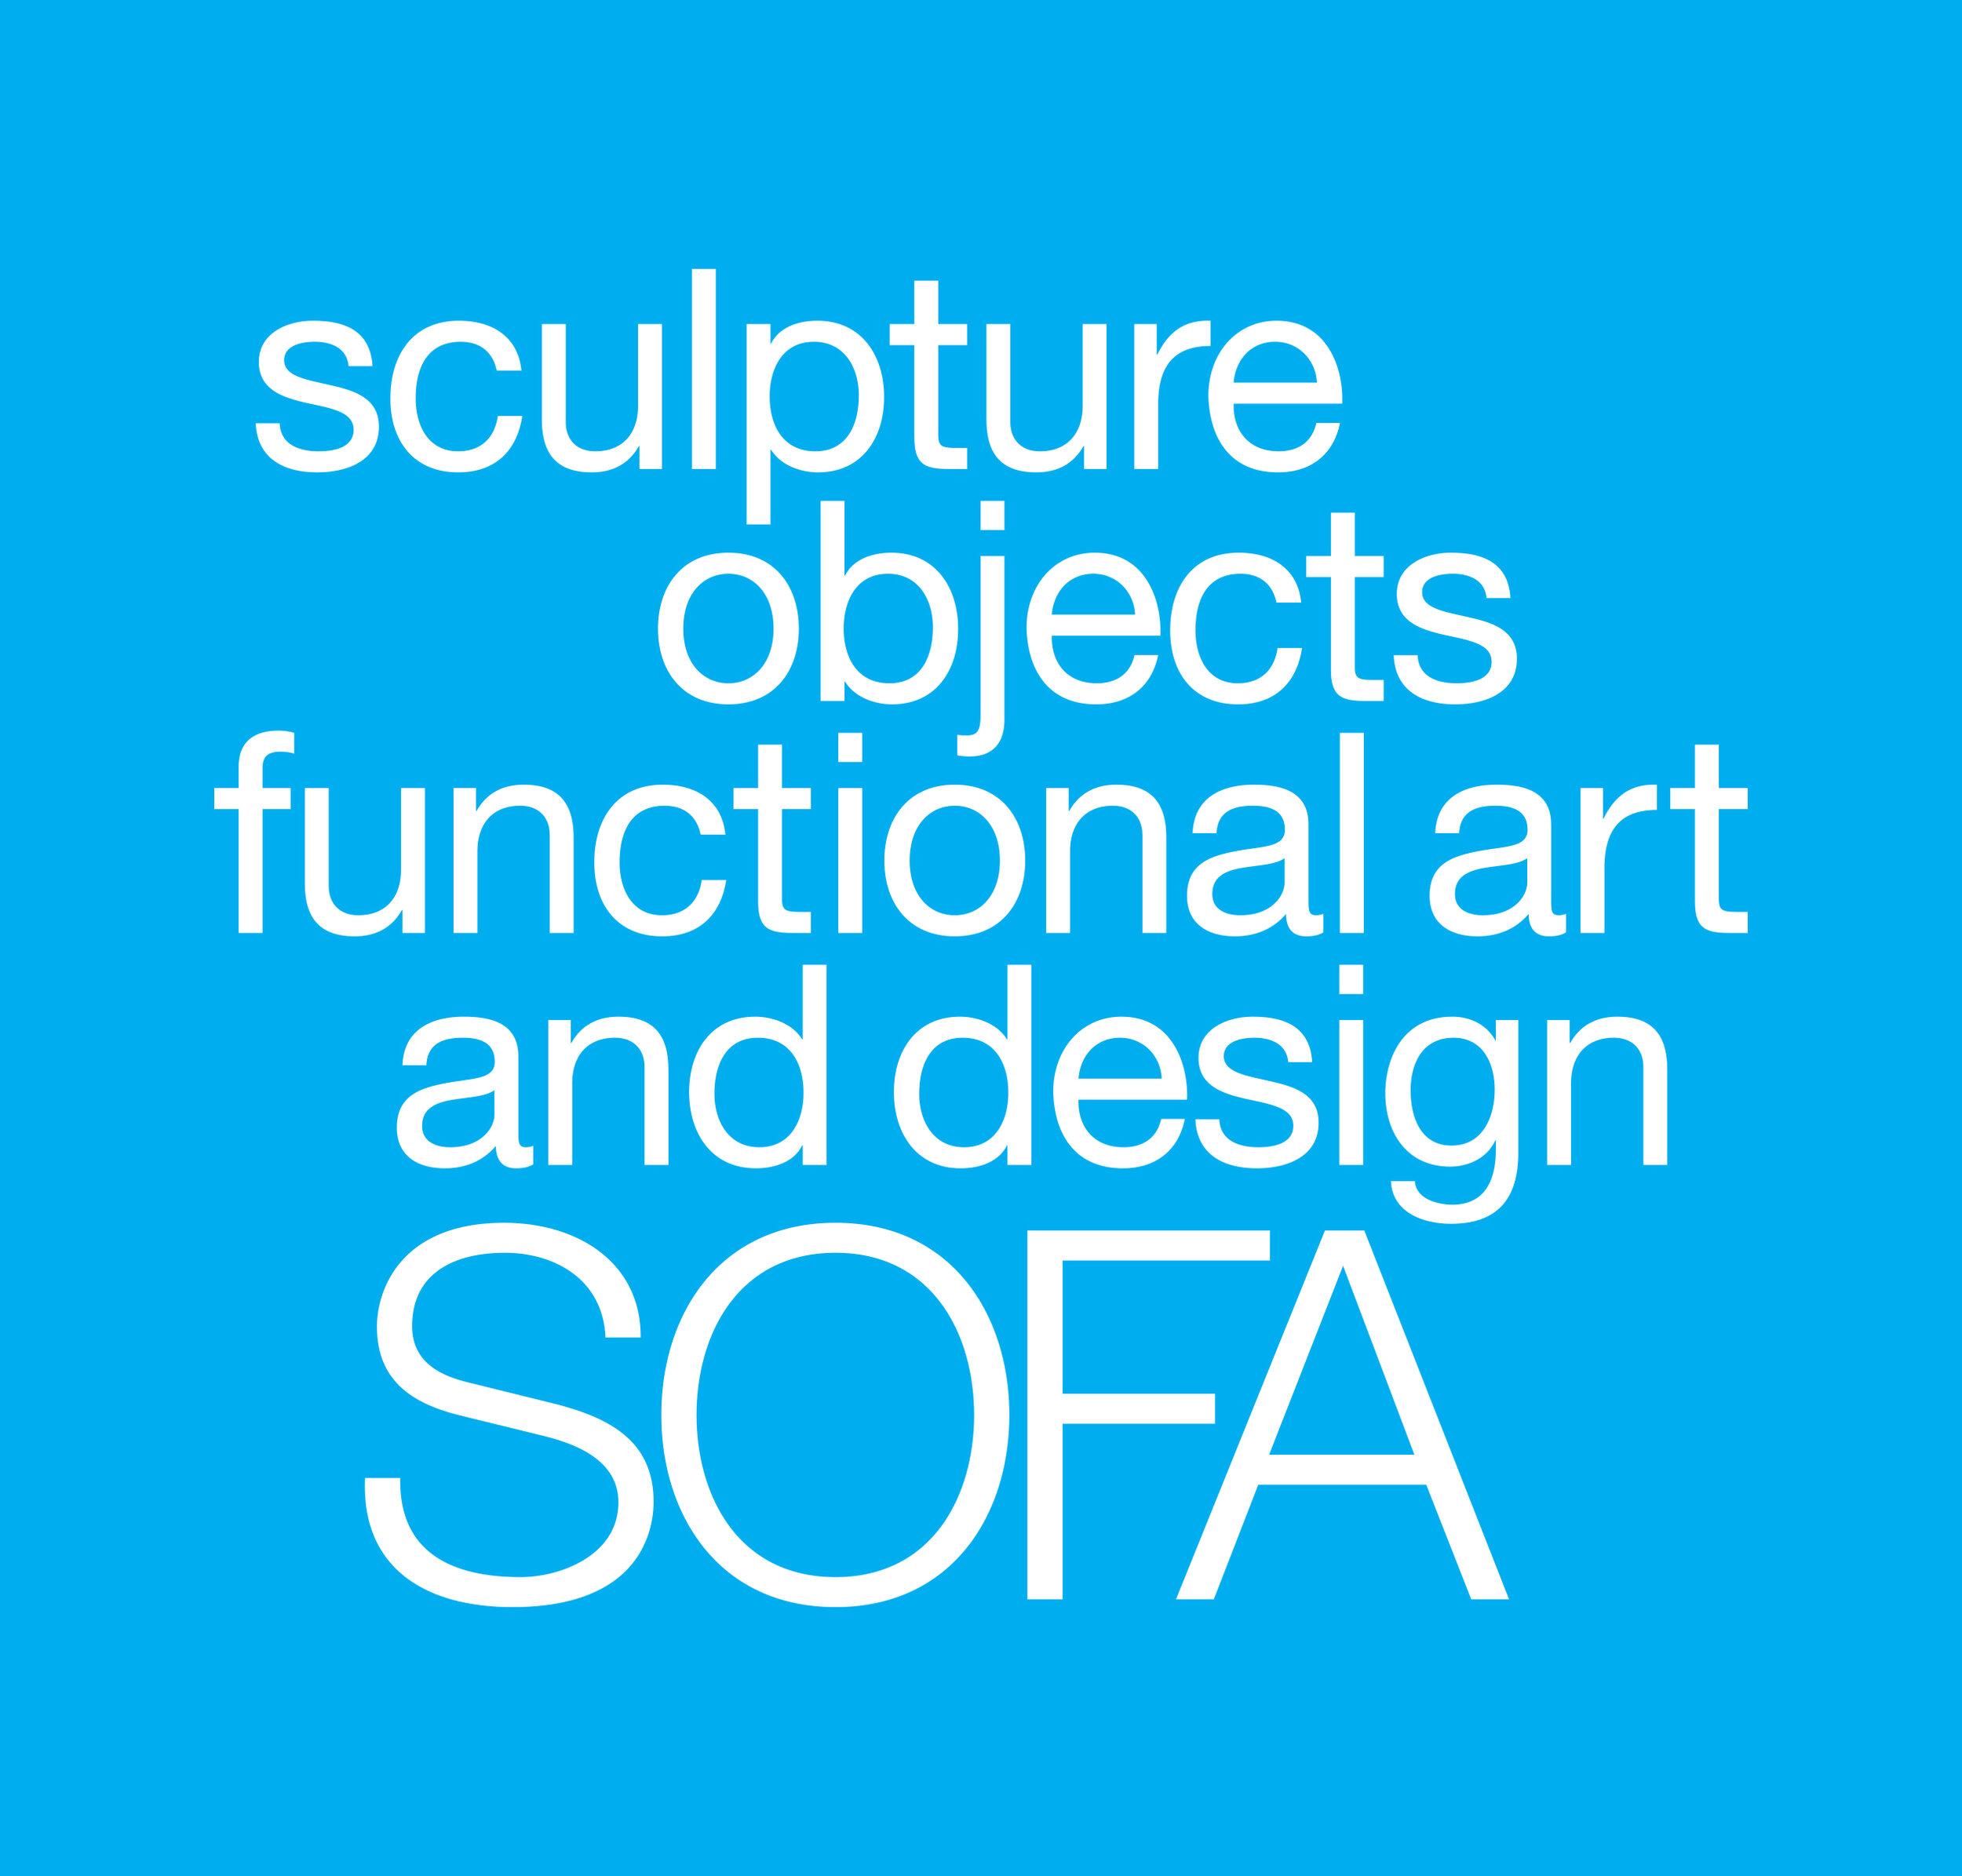 sofa_logo_vertical-blu_35287078036_o.jpg